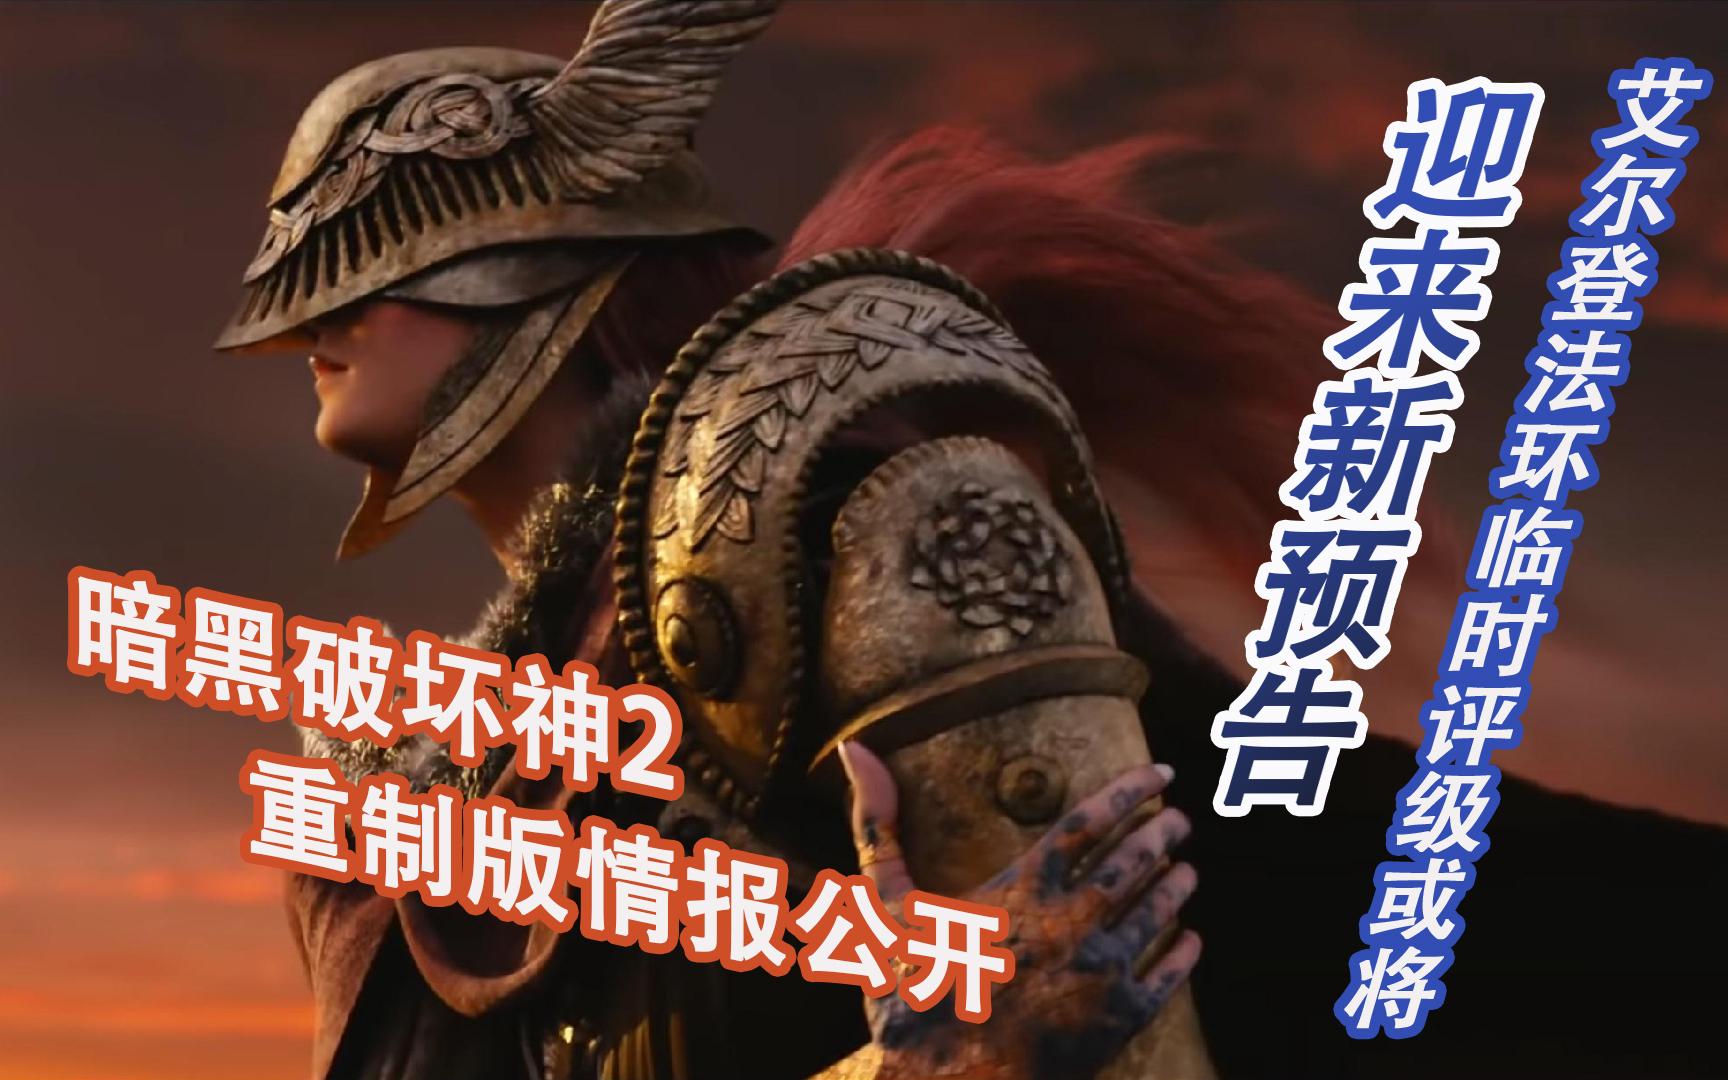 【STEAM游戏资讯】《Elden Ring》官网更新临时评级,暗黑破坏神2重制版情报公开